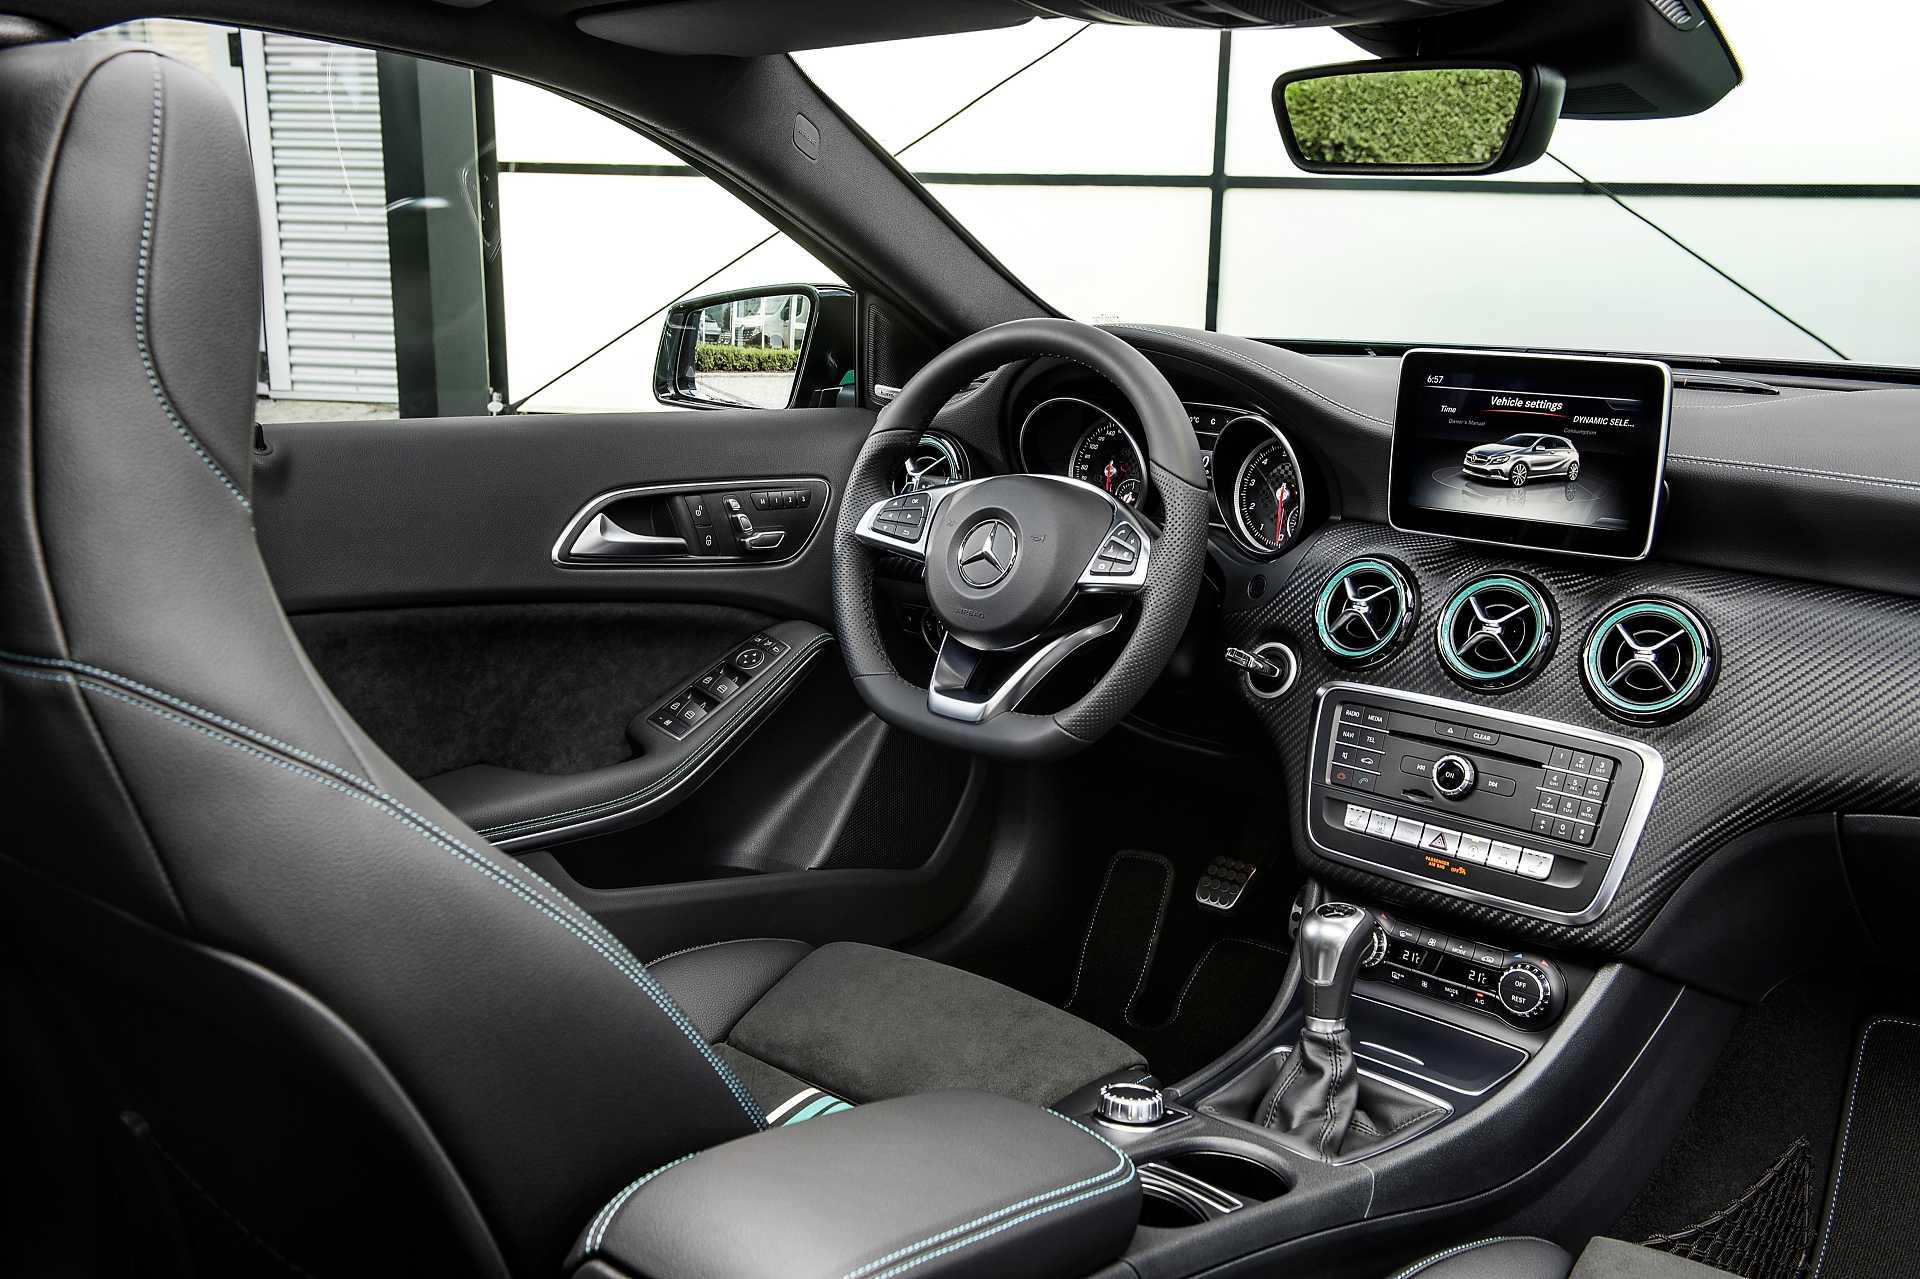 https://s.car.info/image_files/1920/mercedes-benz-a-class-5-door-interior-0-192404.jpg